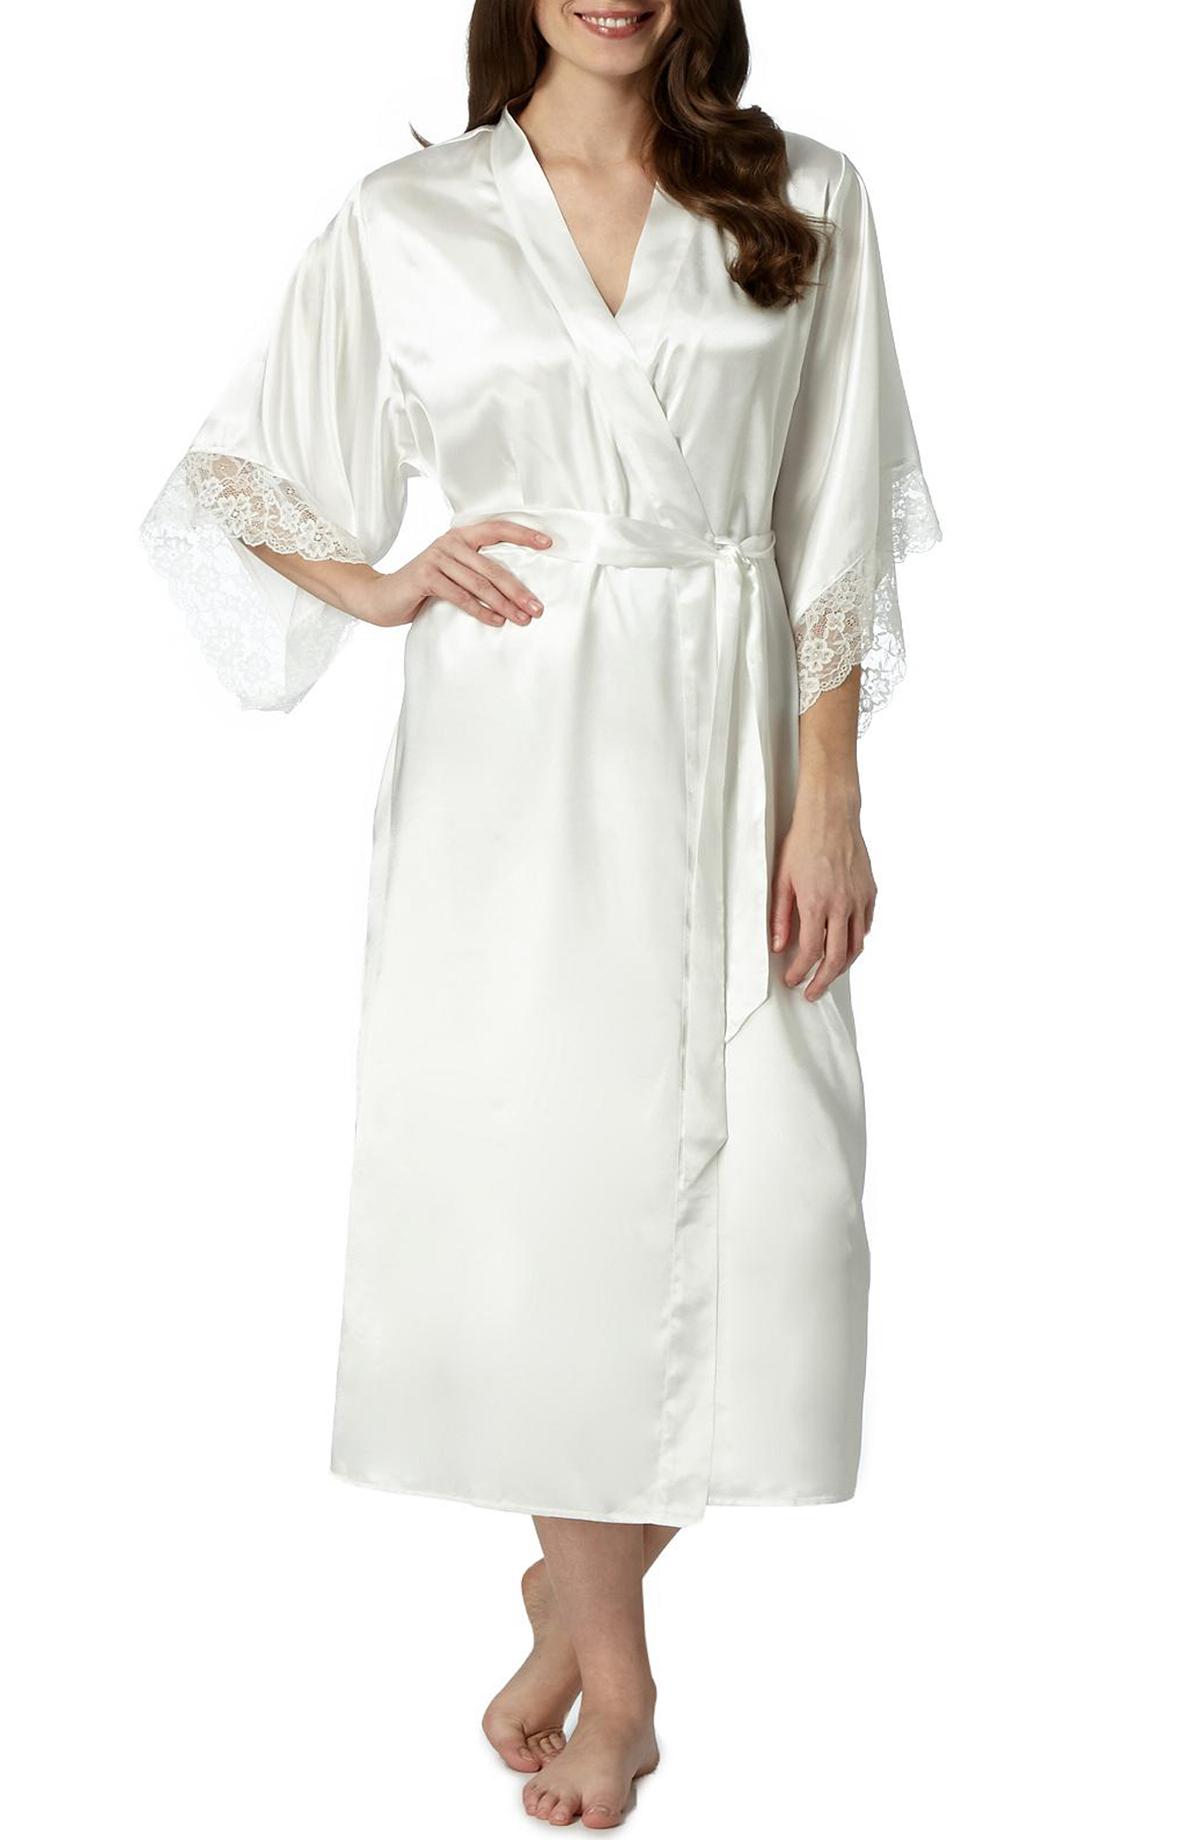 Debenhams - - D3benhams IVORY Lace Cuff Long Dressing Gown - Size 8 ...